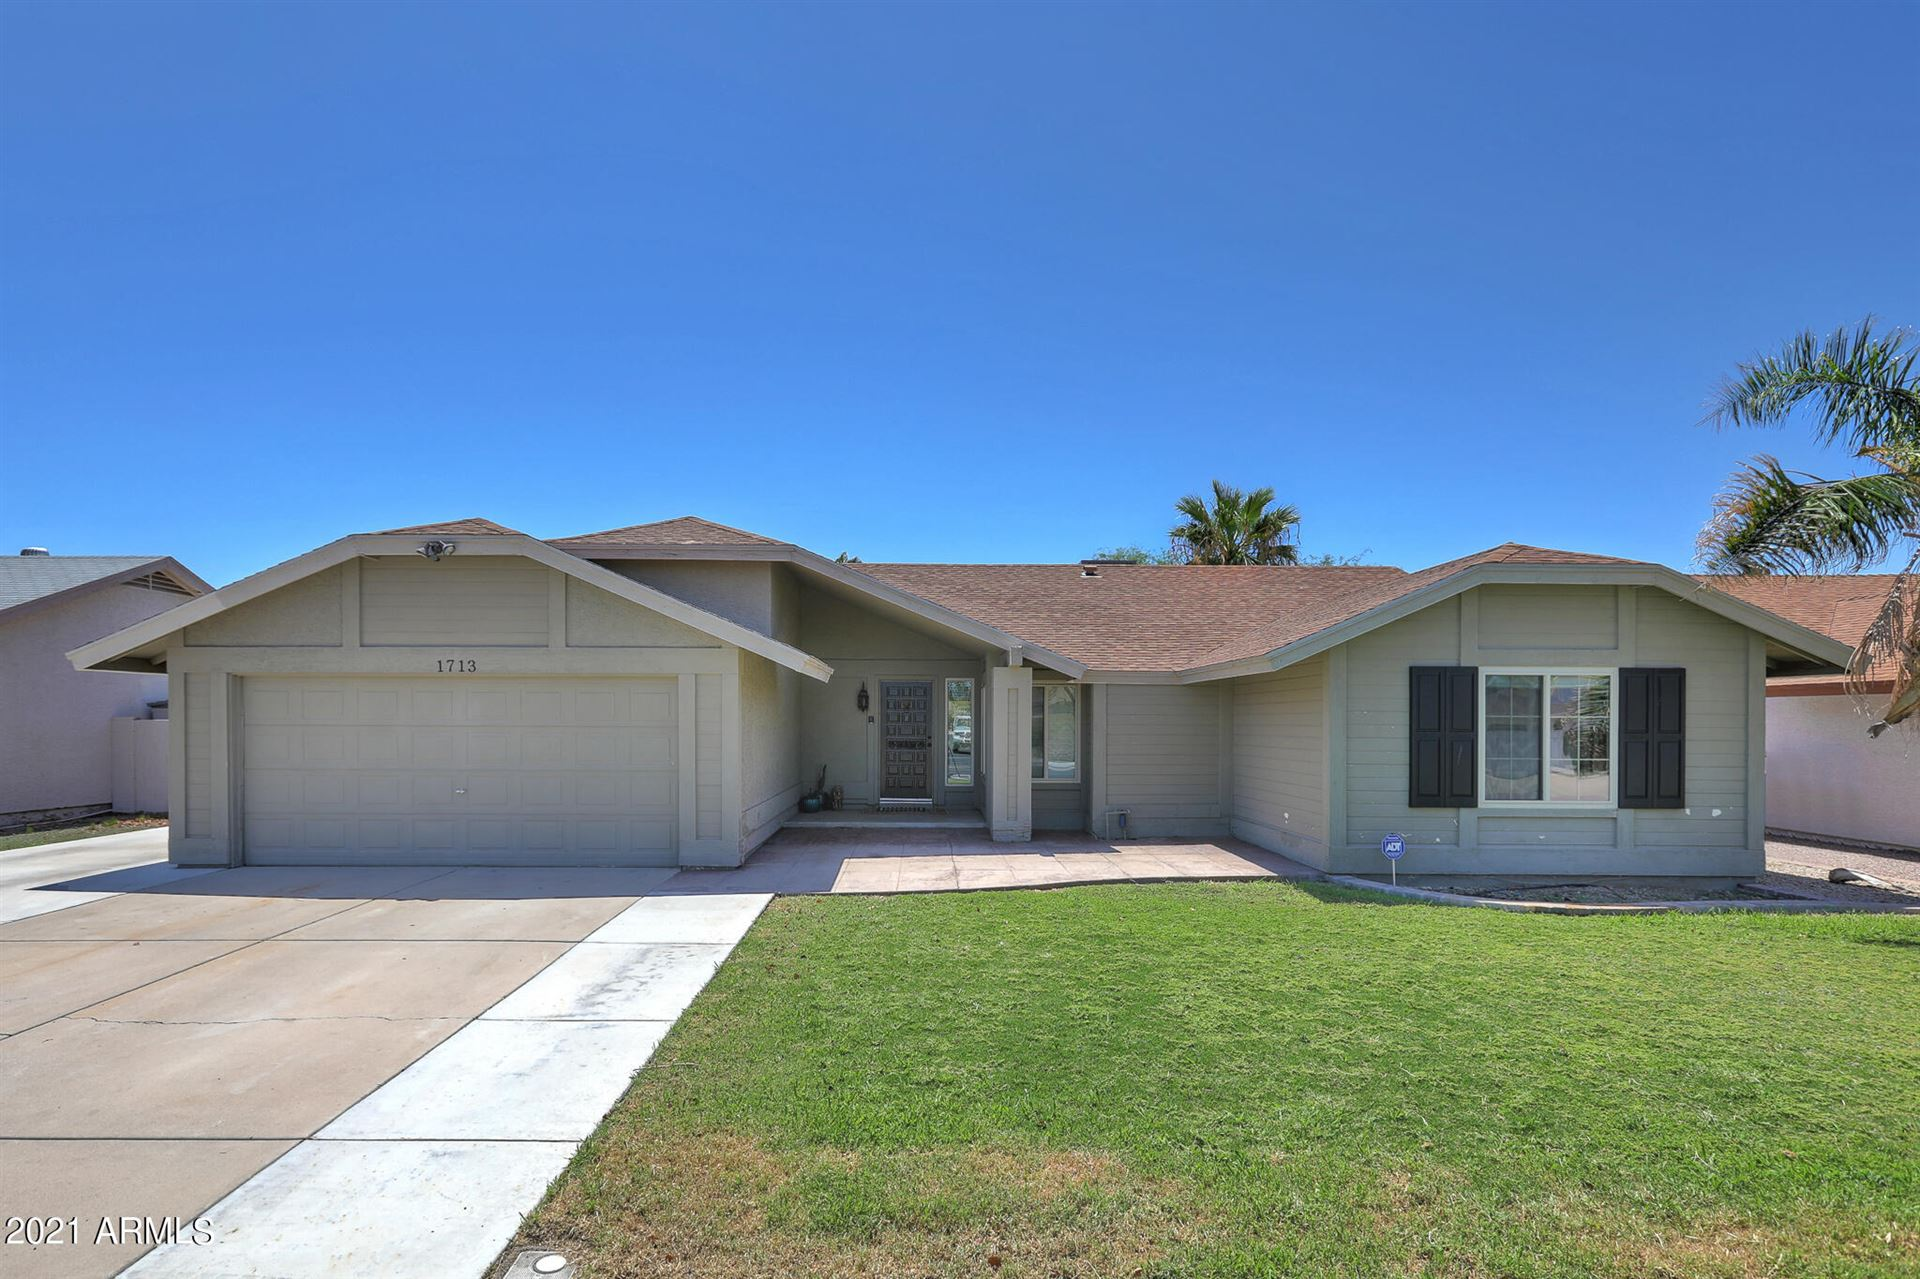 1713 W BROOKS Street, Chandler, AZ 85224 - MLS#: 6273970